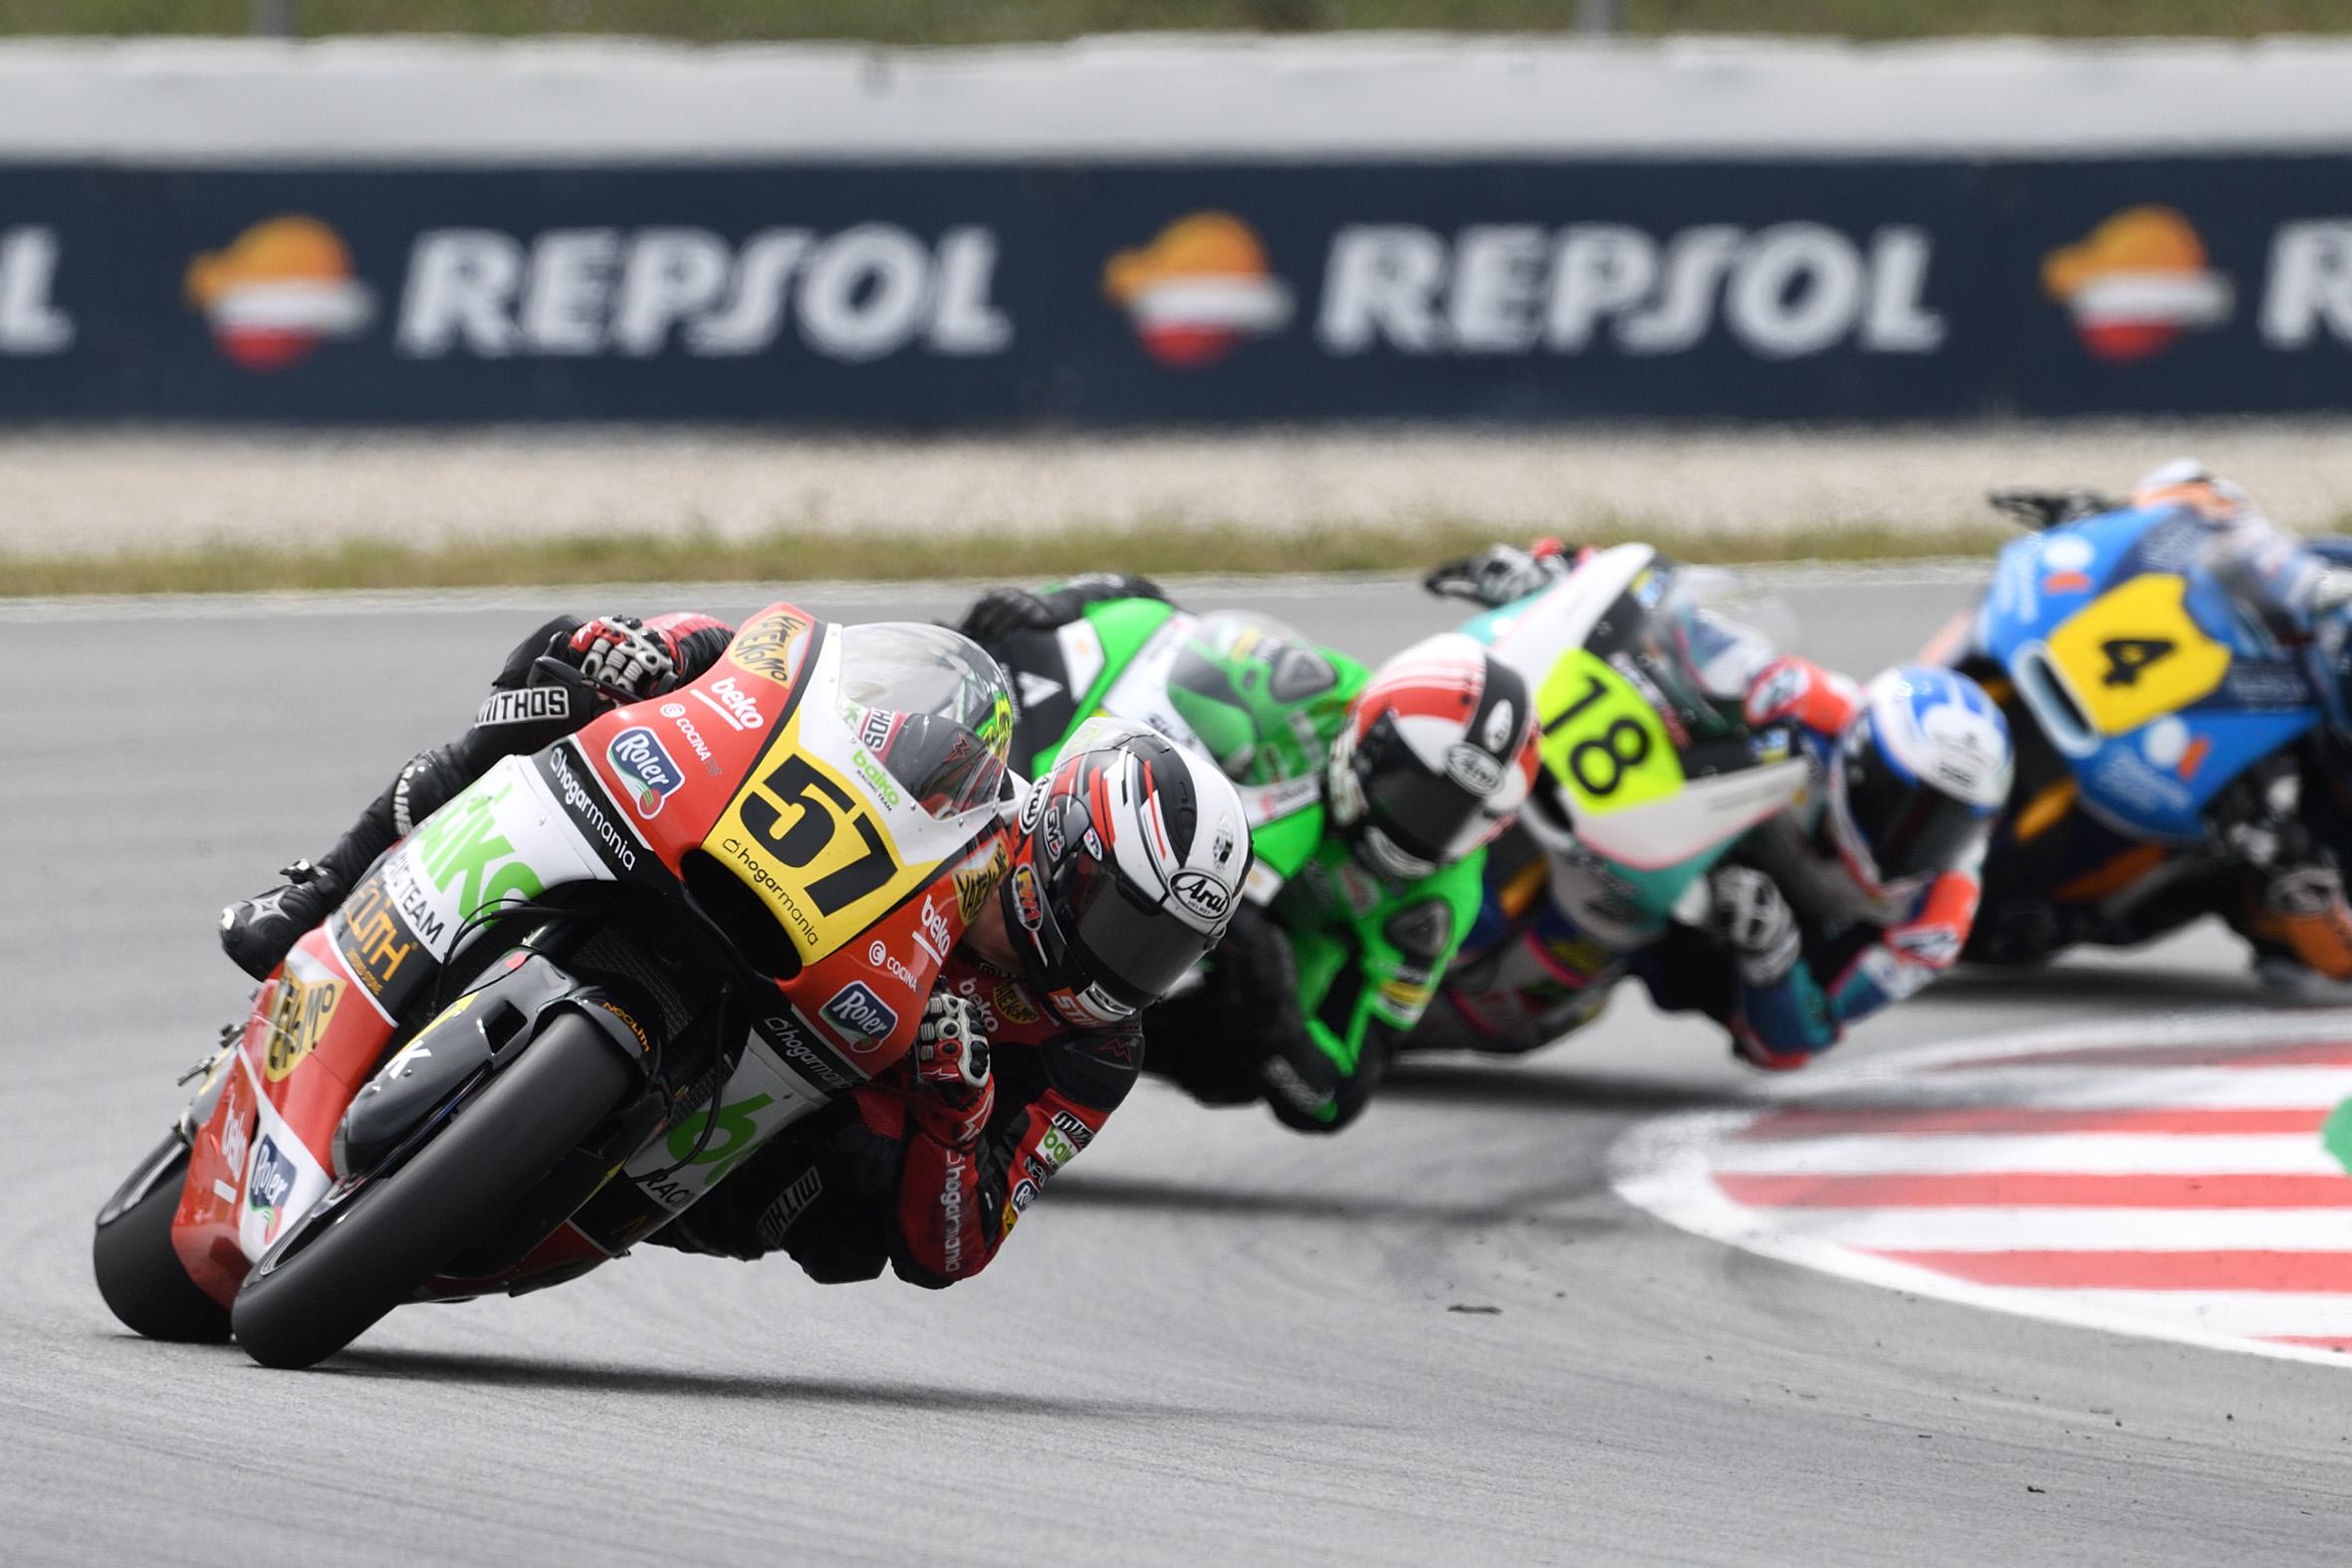 CEV Repsol : MotorLand Aragón dá as boas-vindas ao Campeonato Espanhol de Velocidade